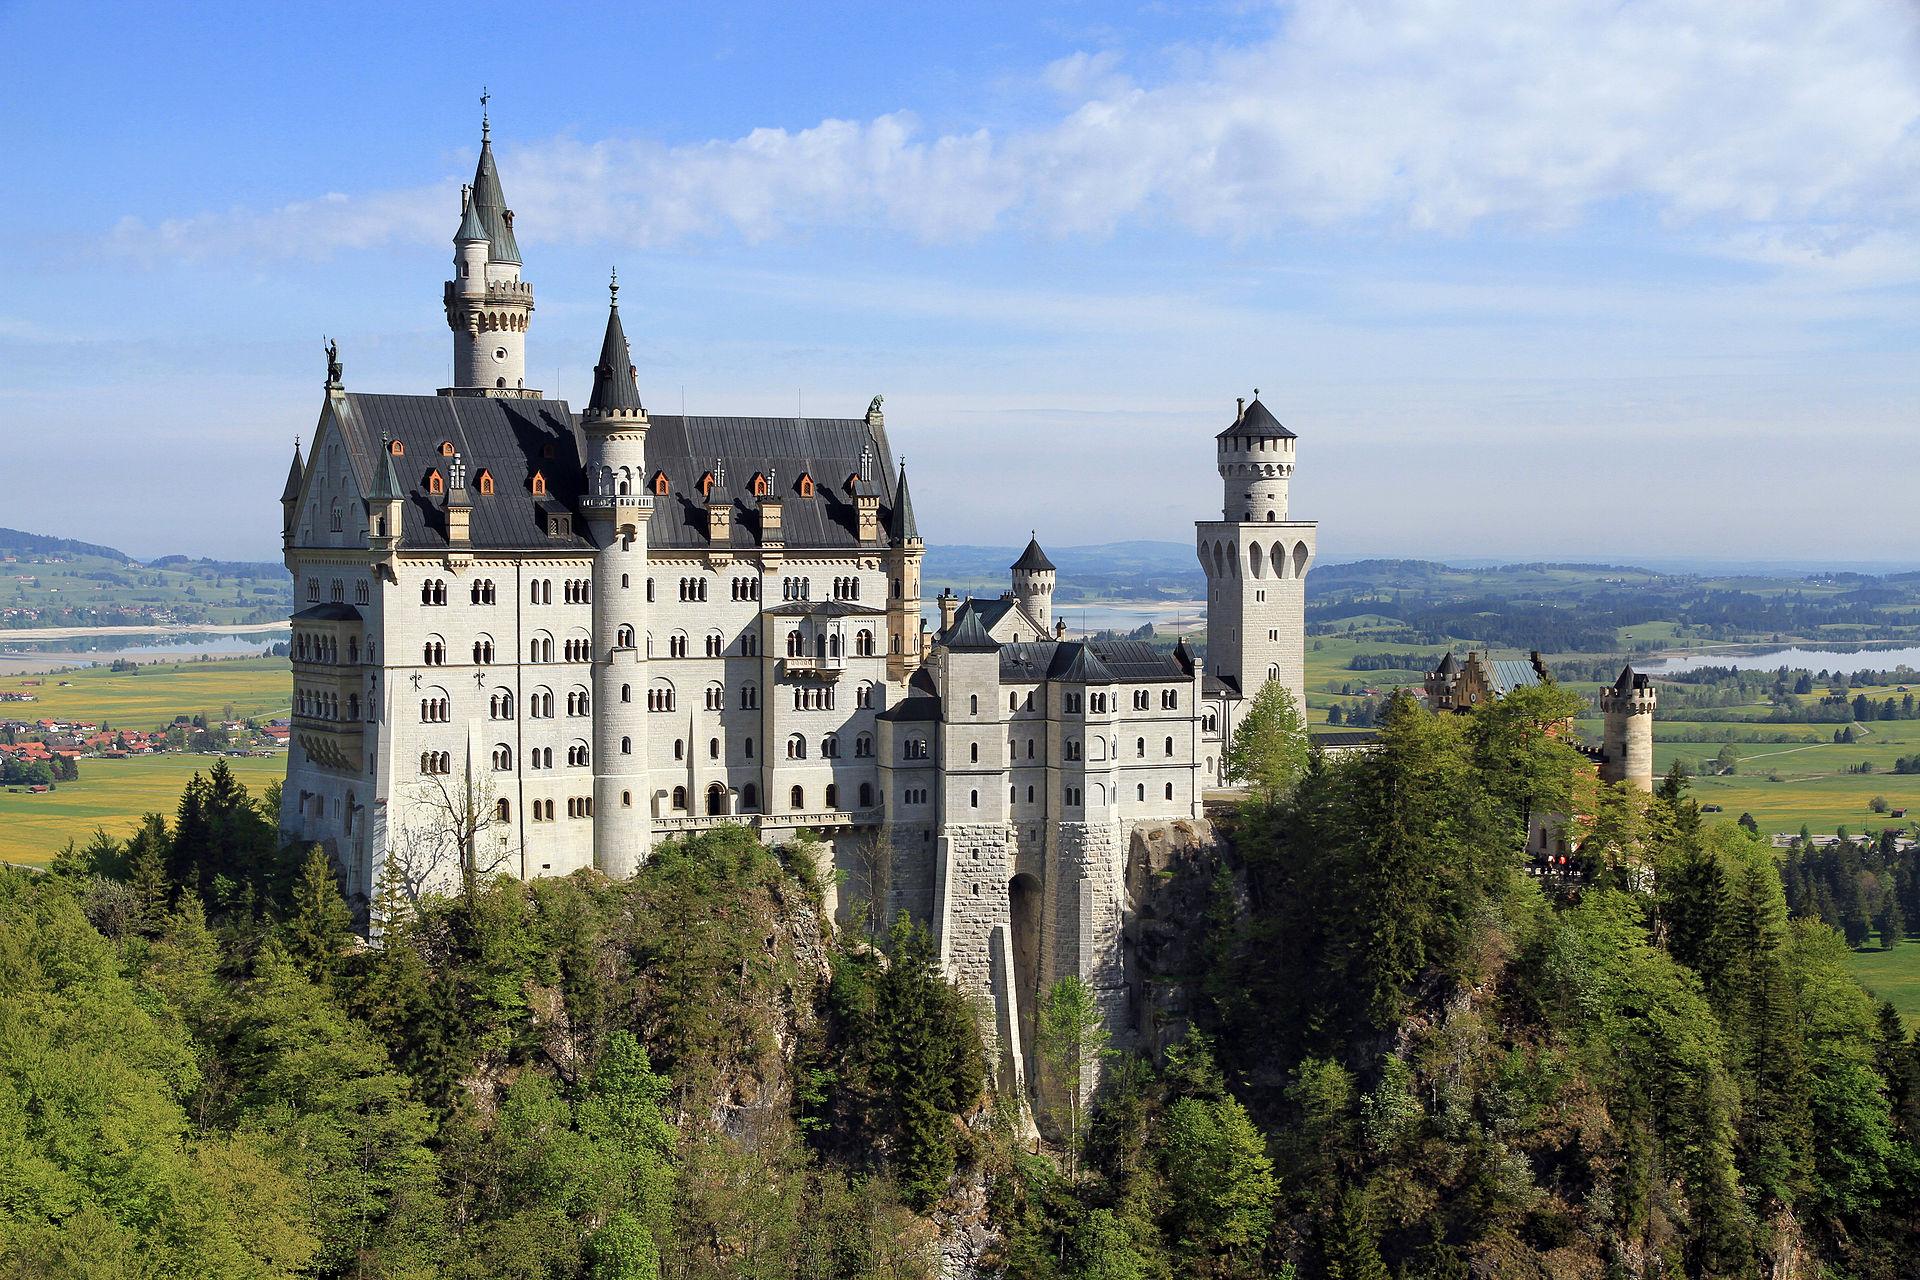 Neuschwanstein_Castle_from_Marienbr%C3%BCcke_2011_May.jpg